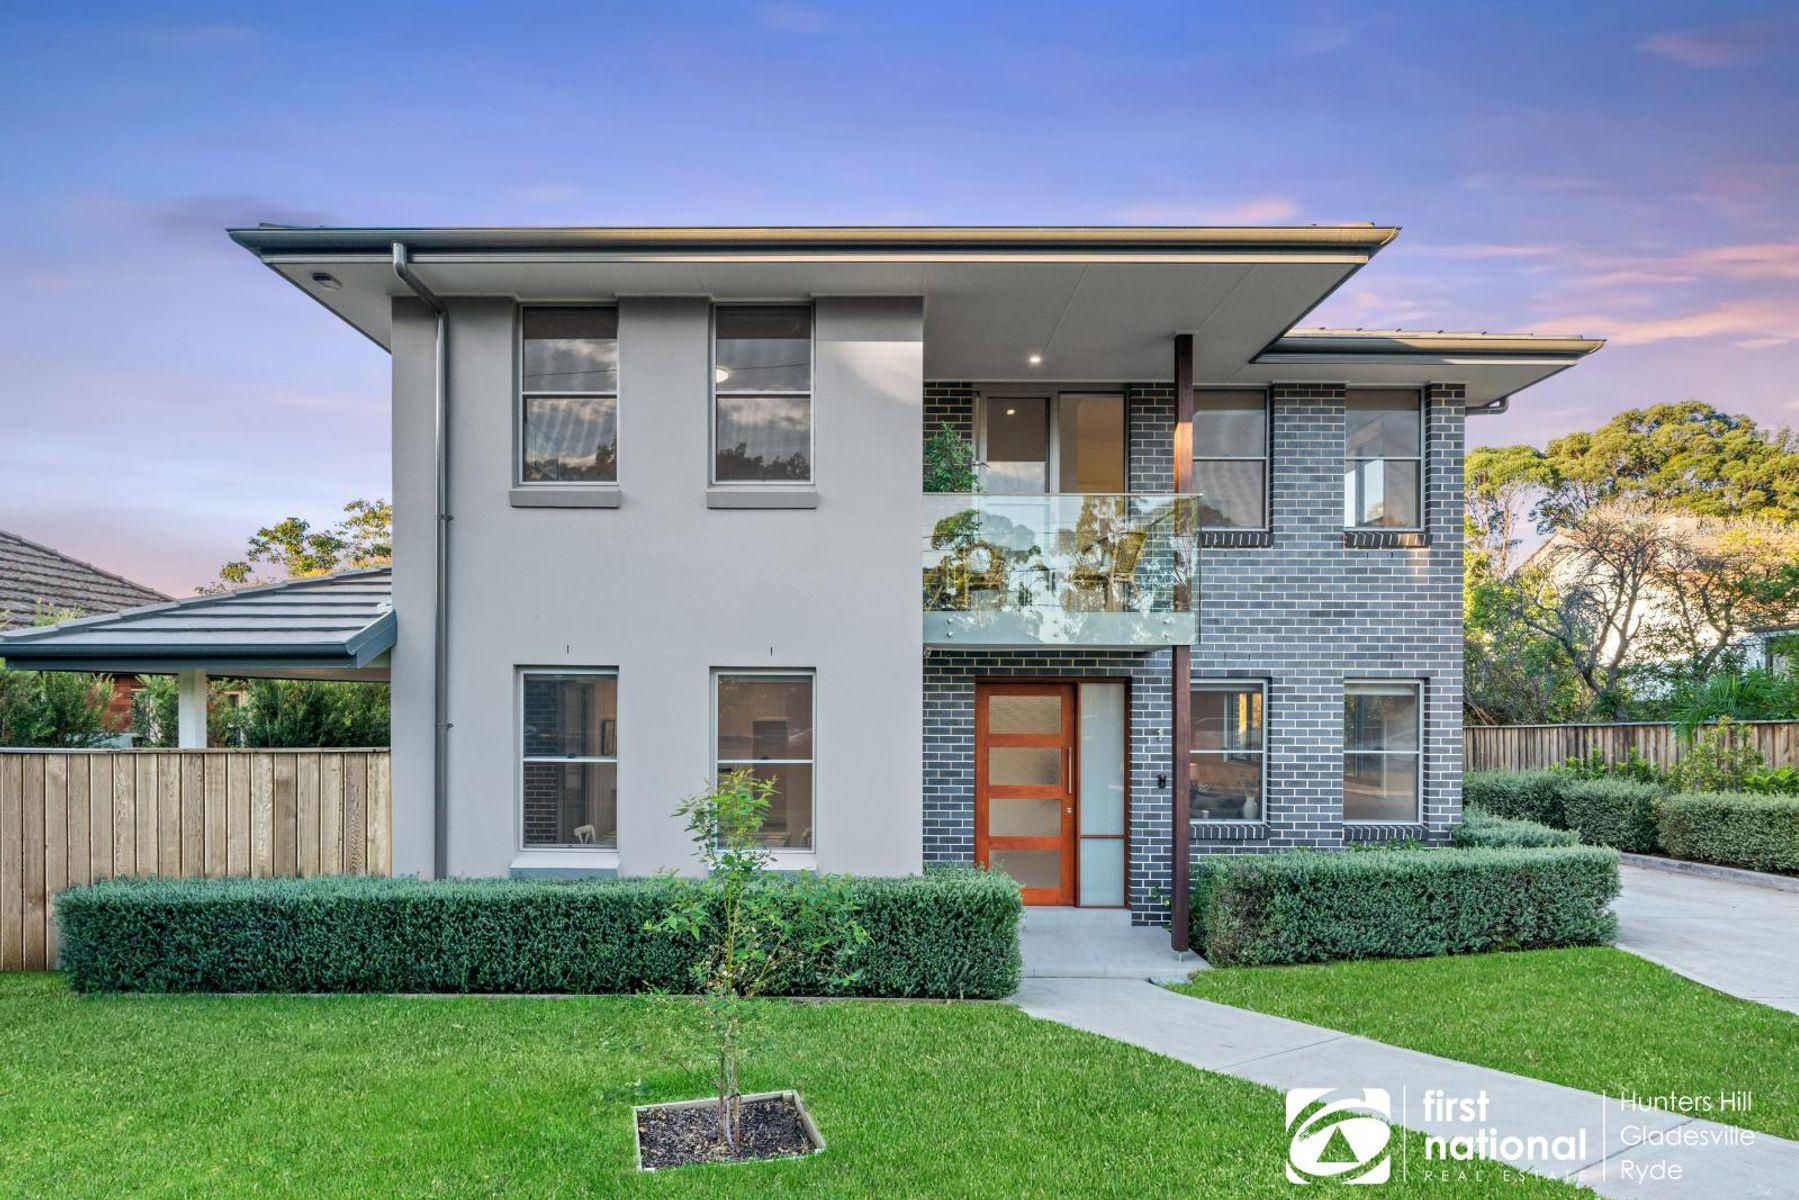 1/64 Denistone Road, Denistone, NSW 2114